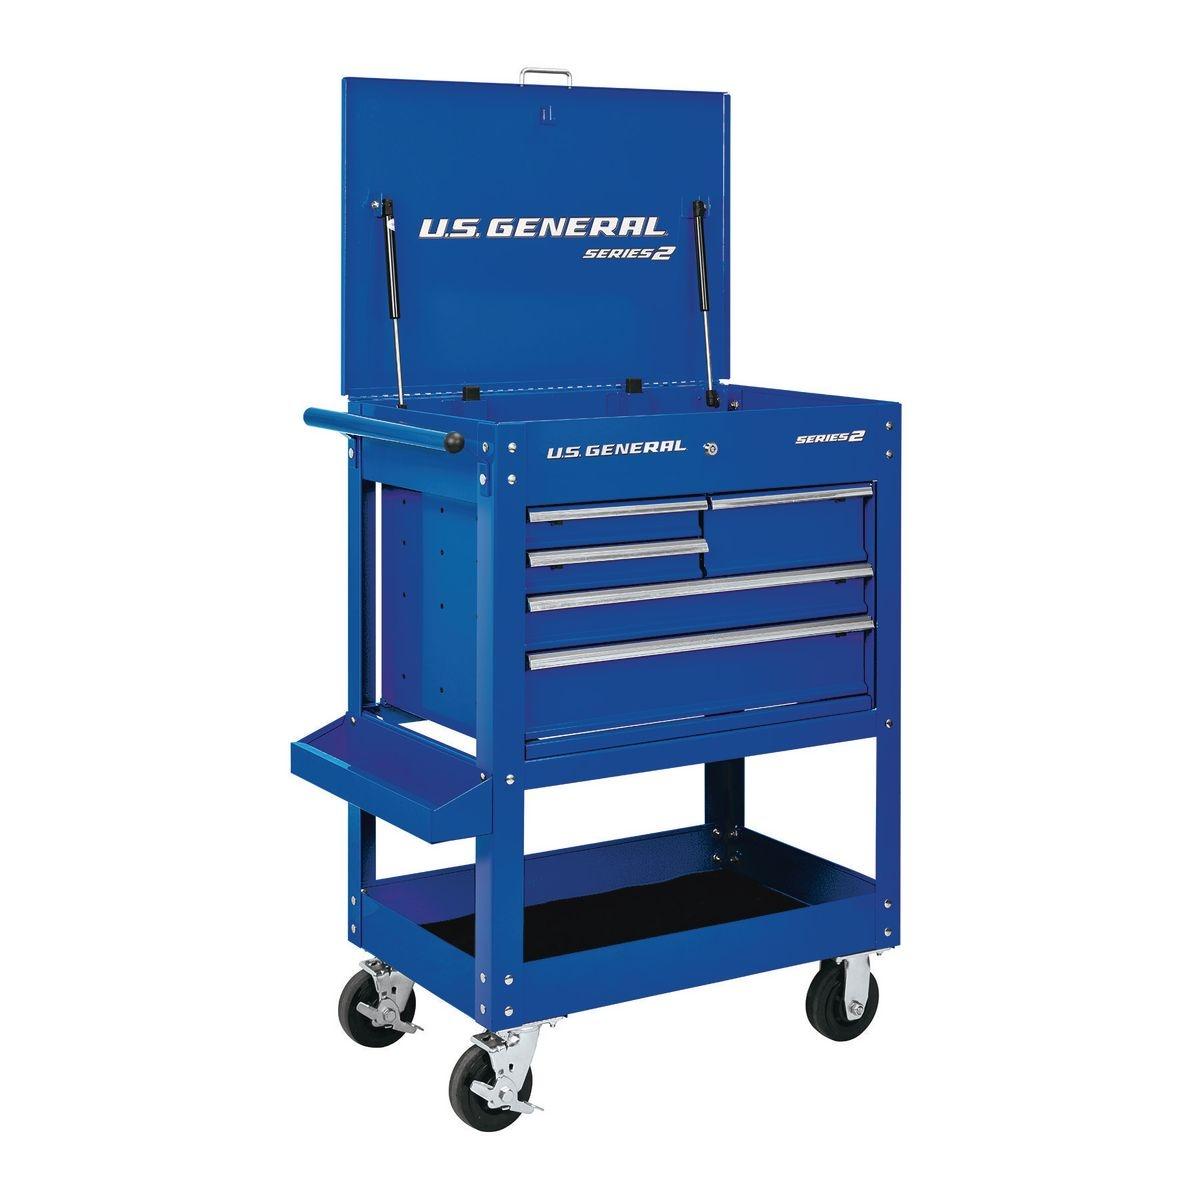 U.S. GENERAL 30 In. 5 Drawer Mechanic's Cart - Blue - Item 64031 / 56727 / 56728 / 56429